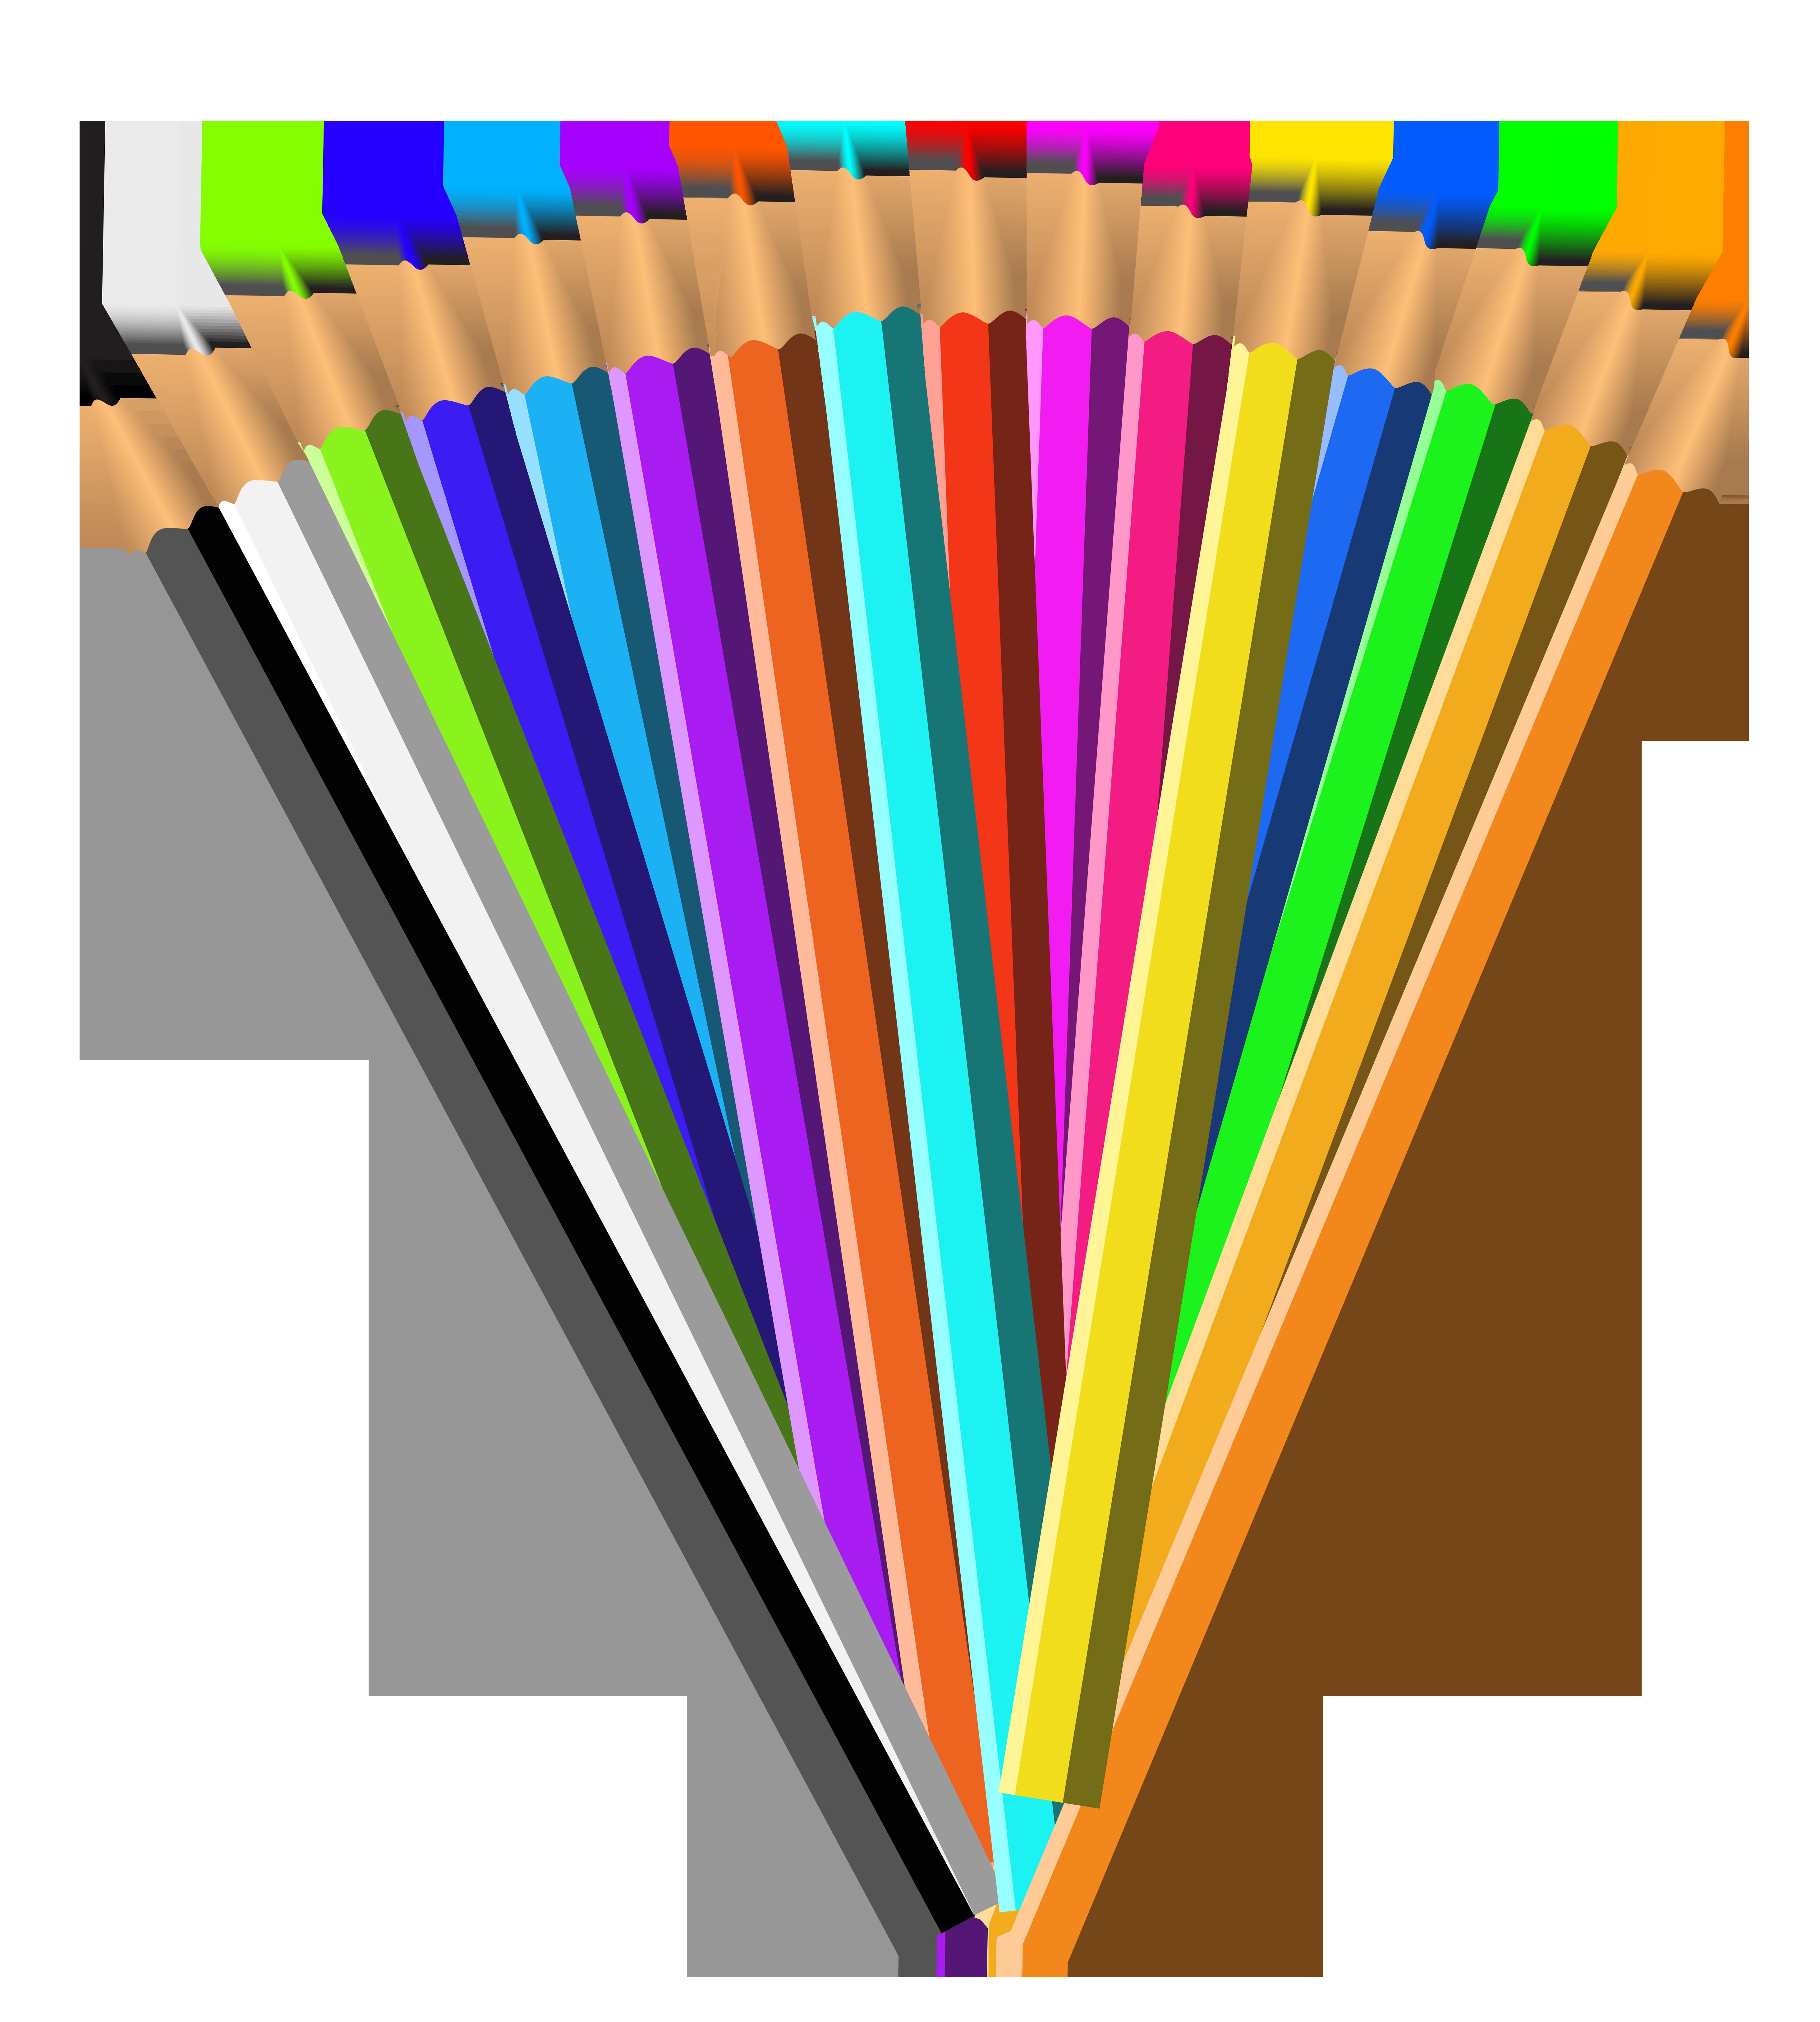 Pencils png image gallery. Clipart pencil transparent background